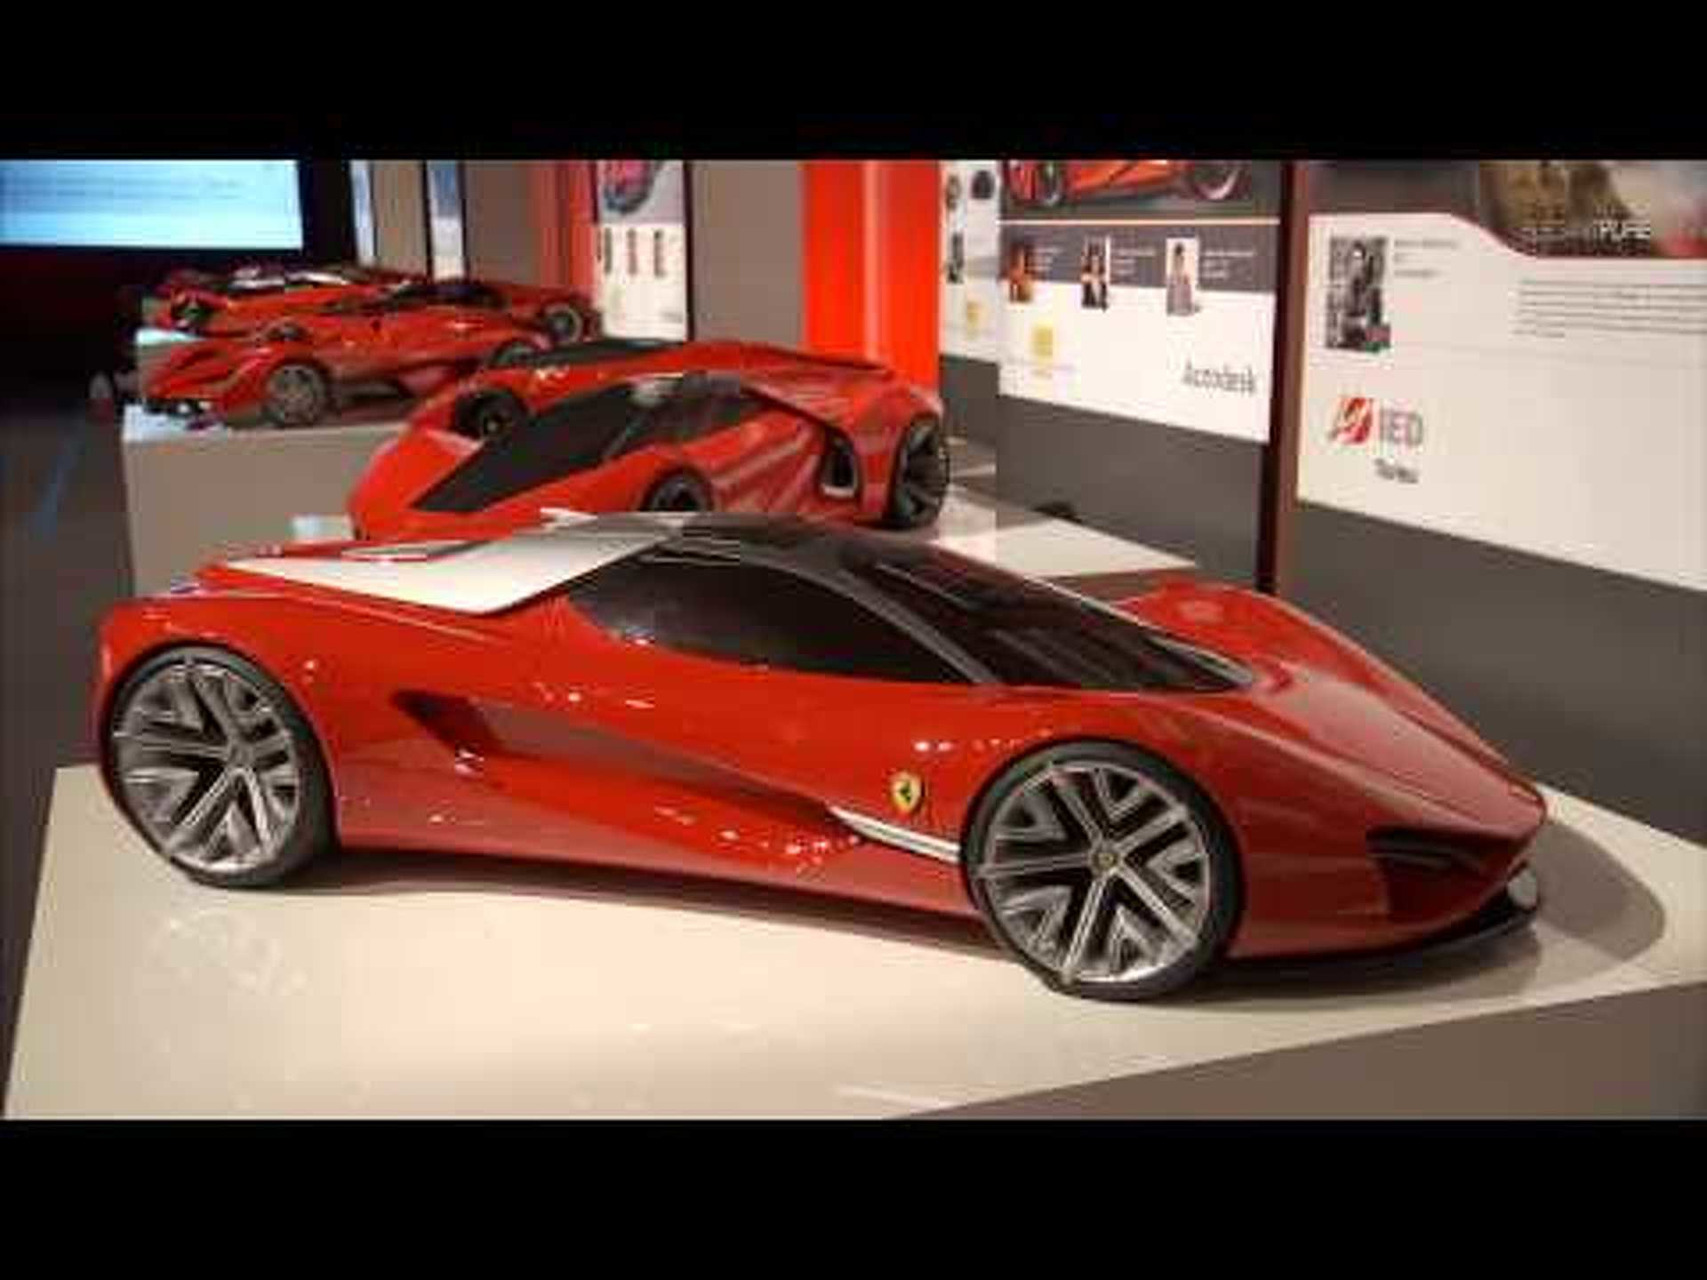 Ferrari World Design Contest 2011 - Winner Ceremony